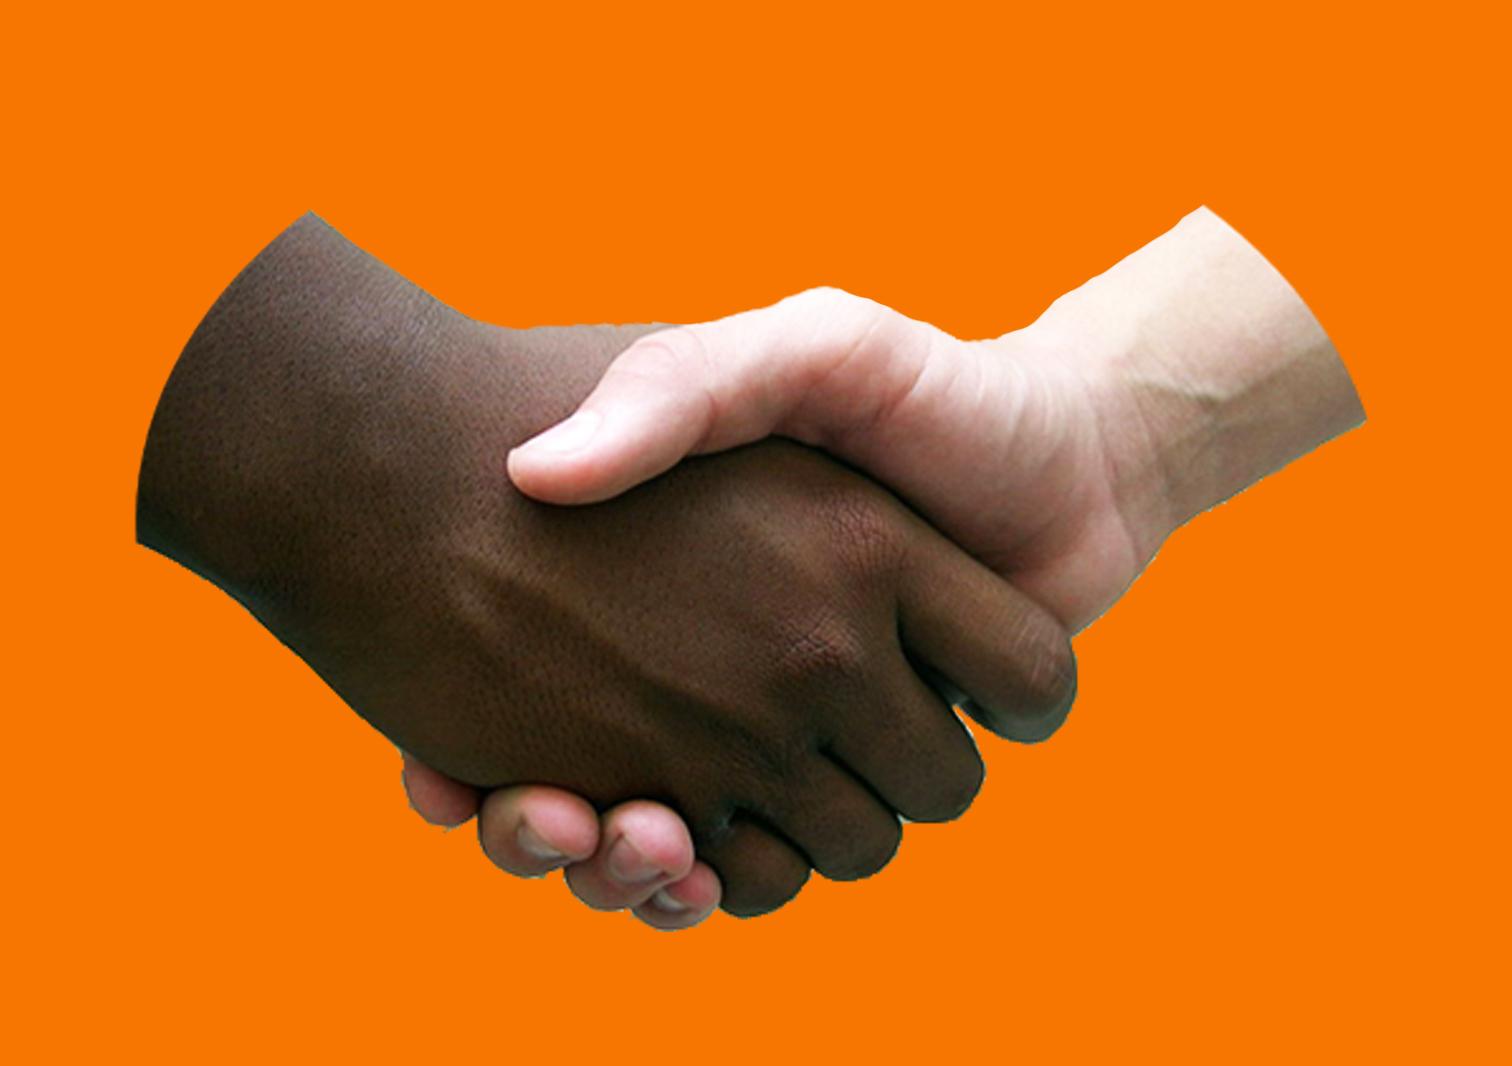 Friendship & Social Interaction